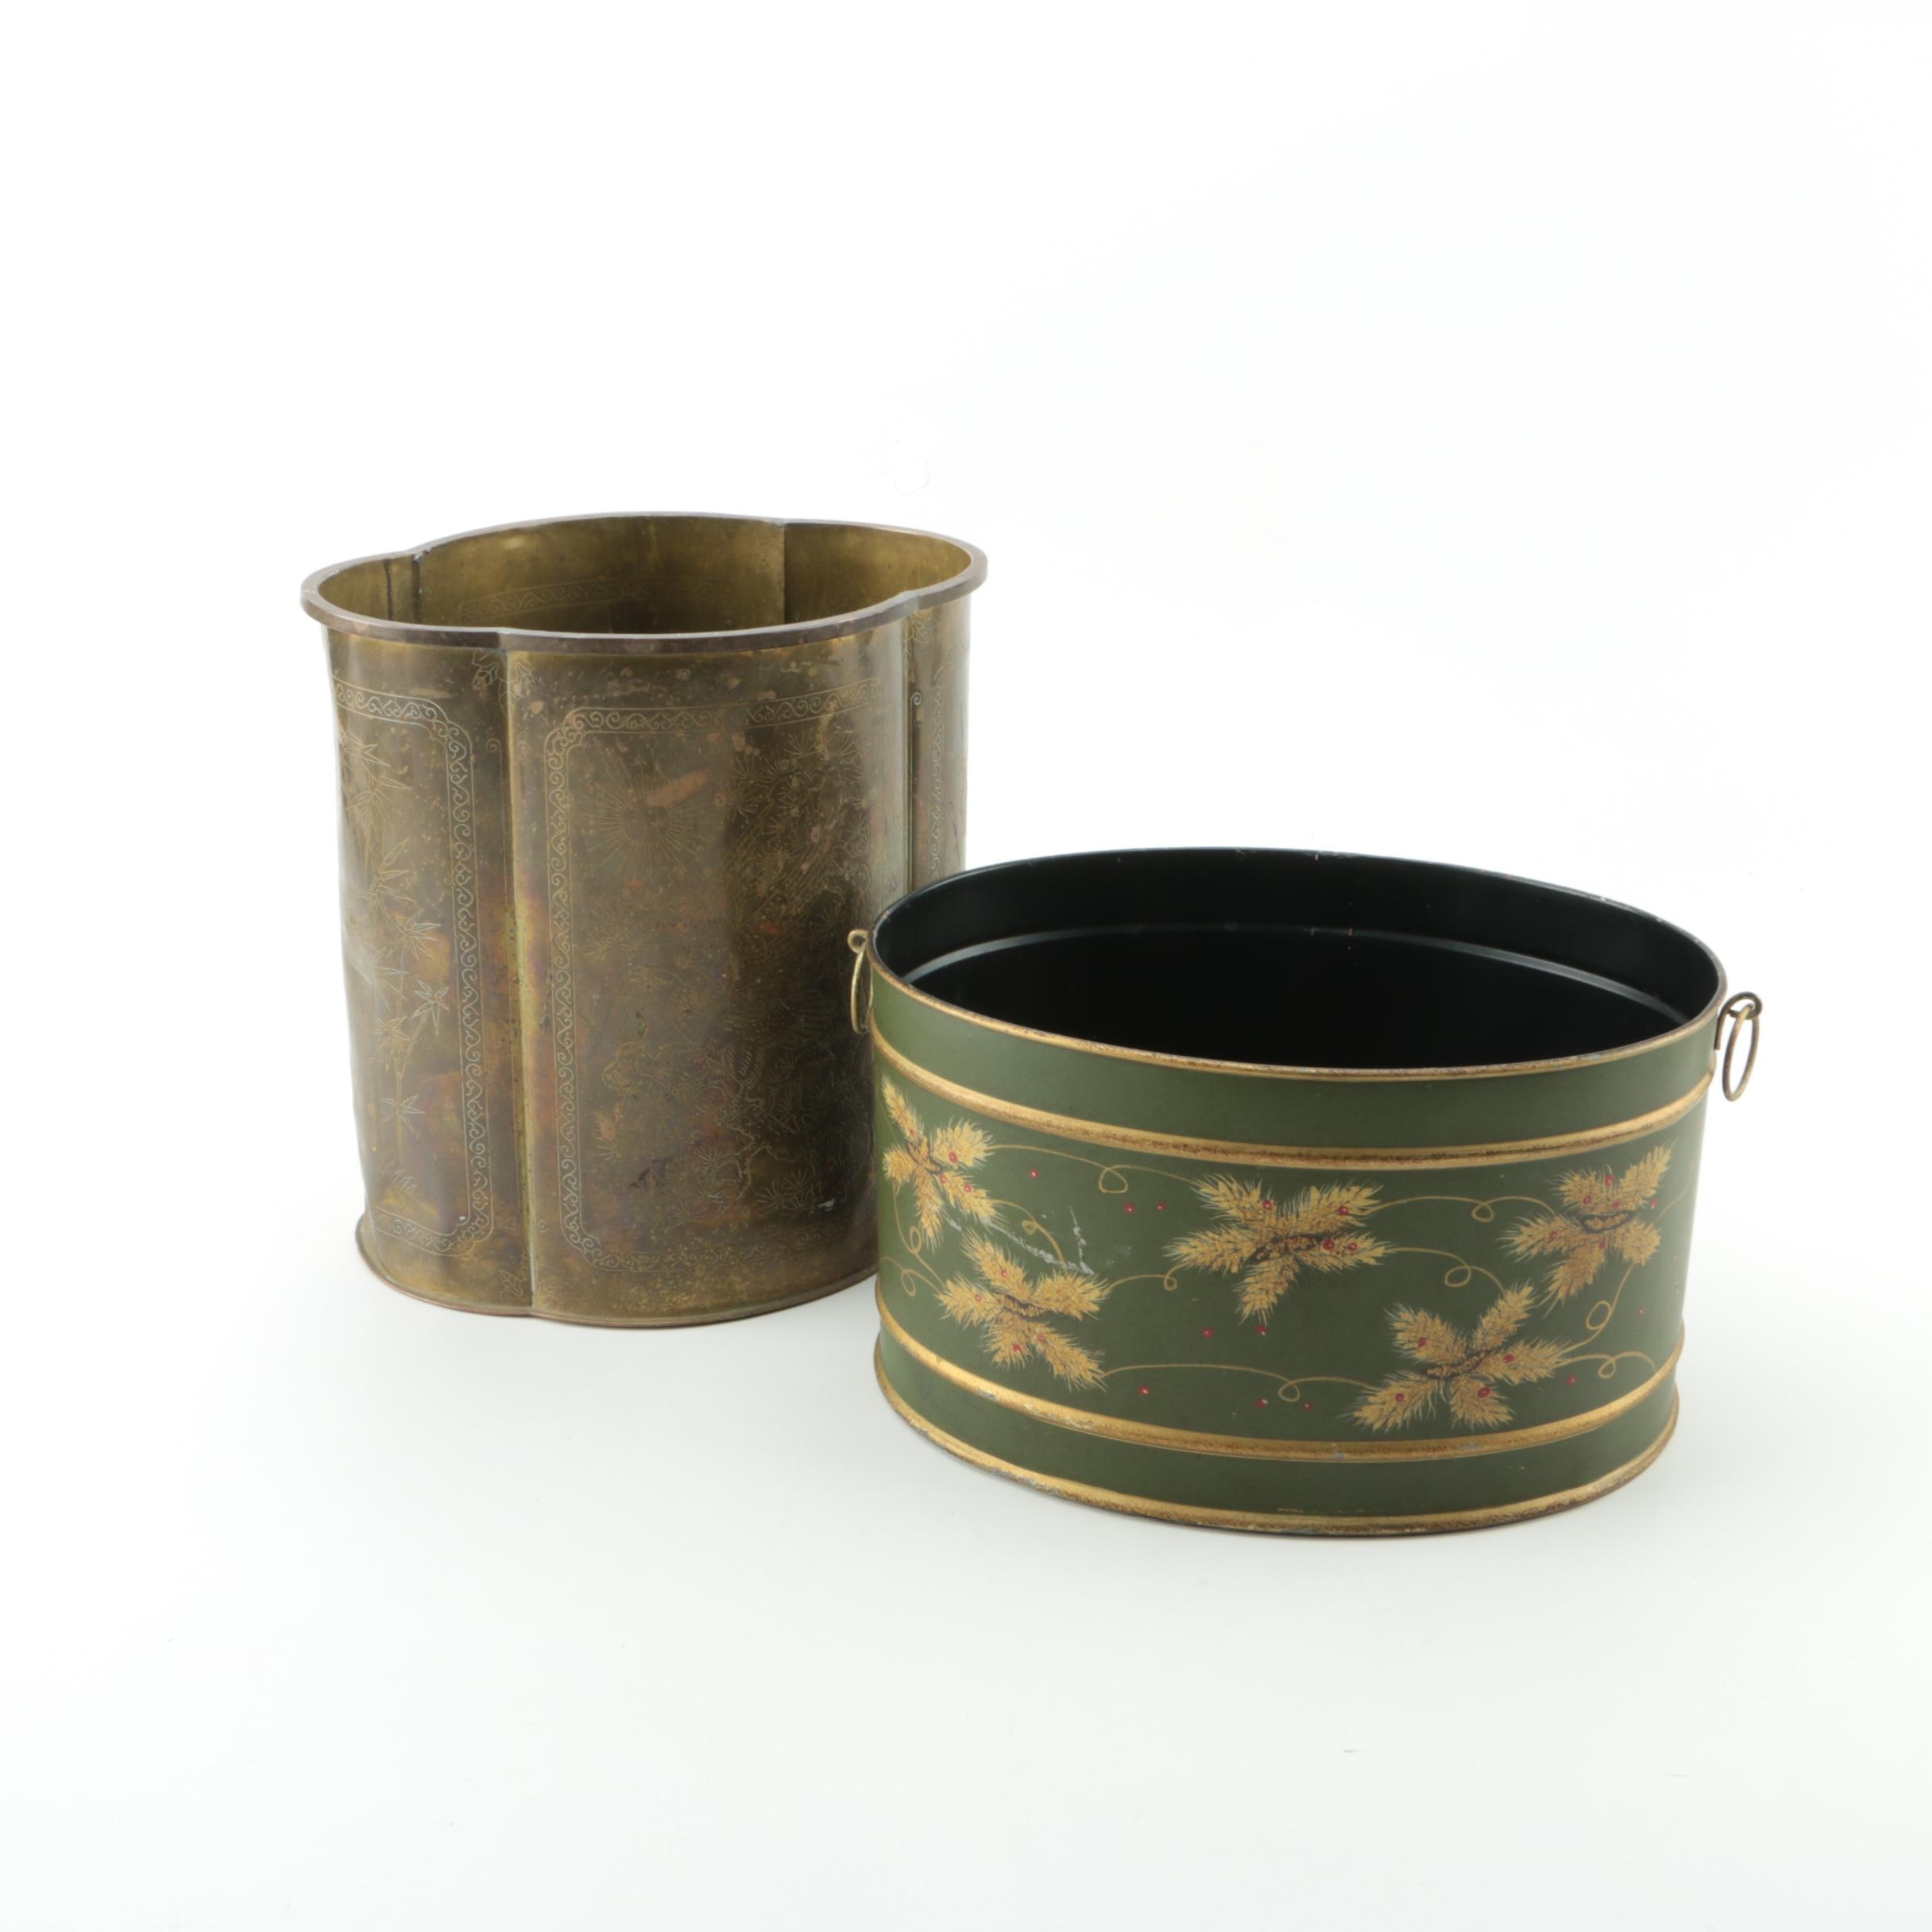 Decorative Brass Bins